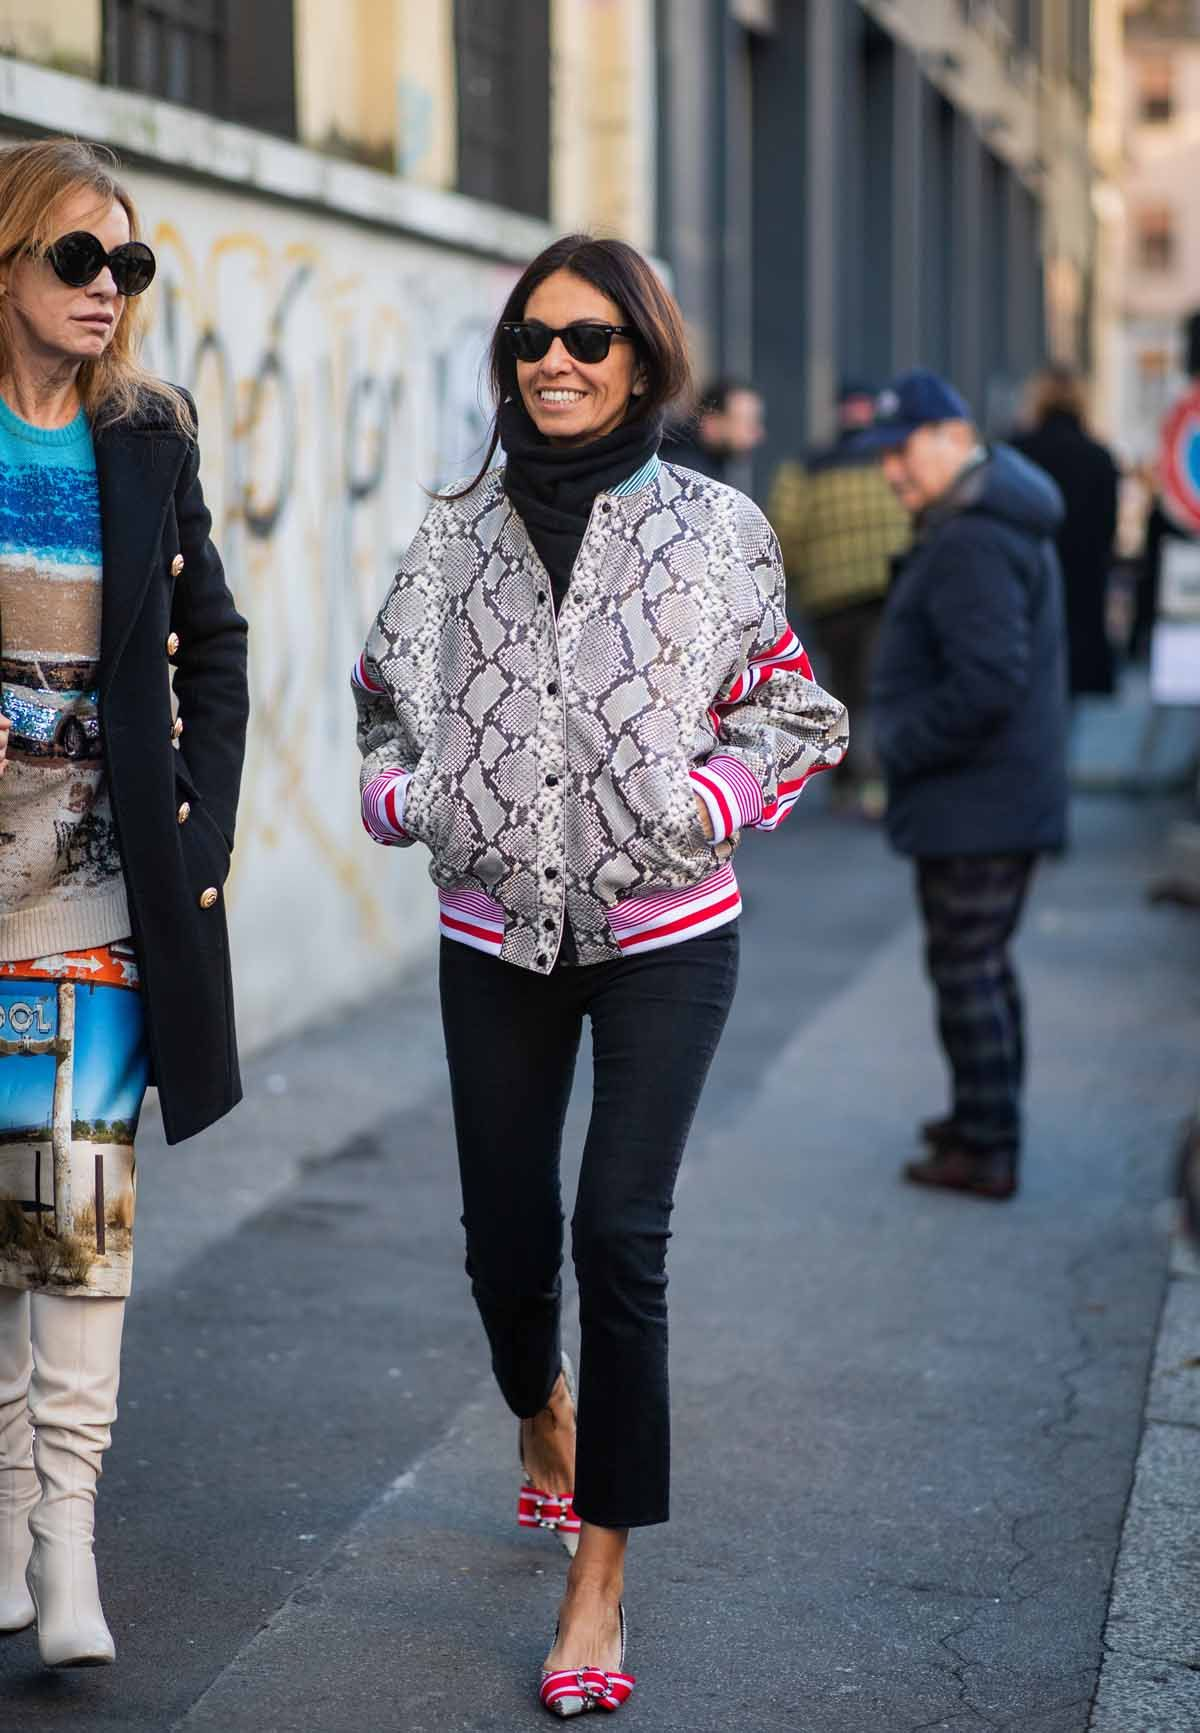 Street Style: January 14 - Milan Men's Fashion Week Autumn/Winter 2019/20